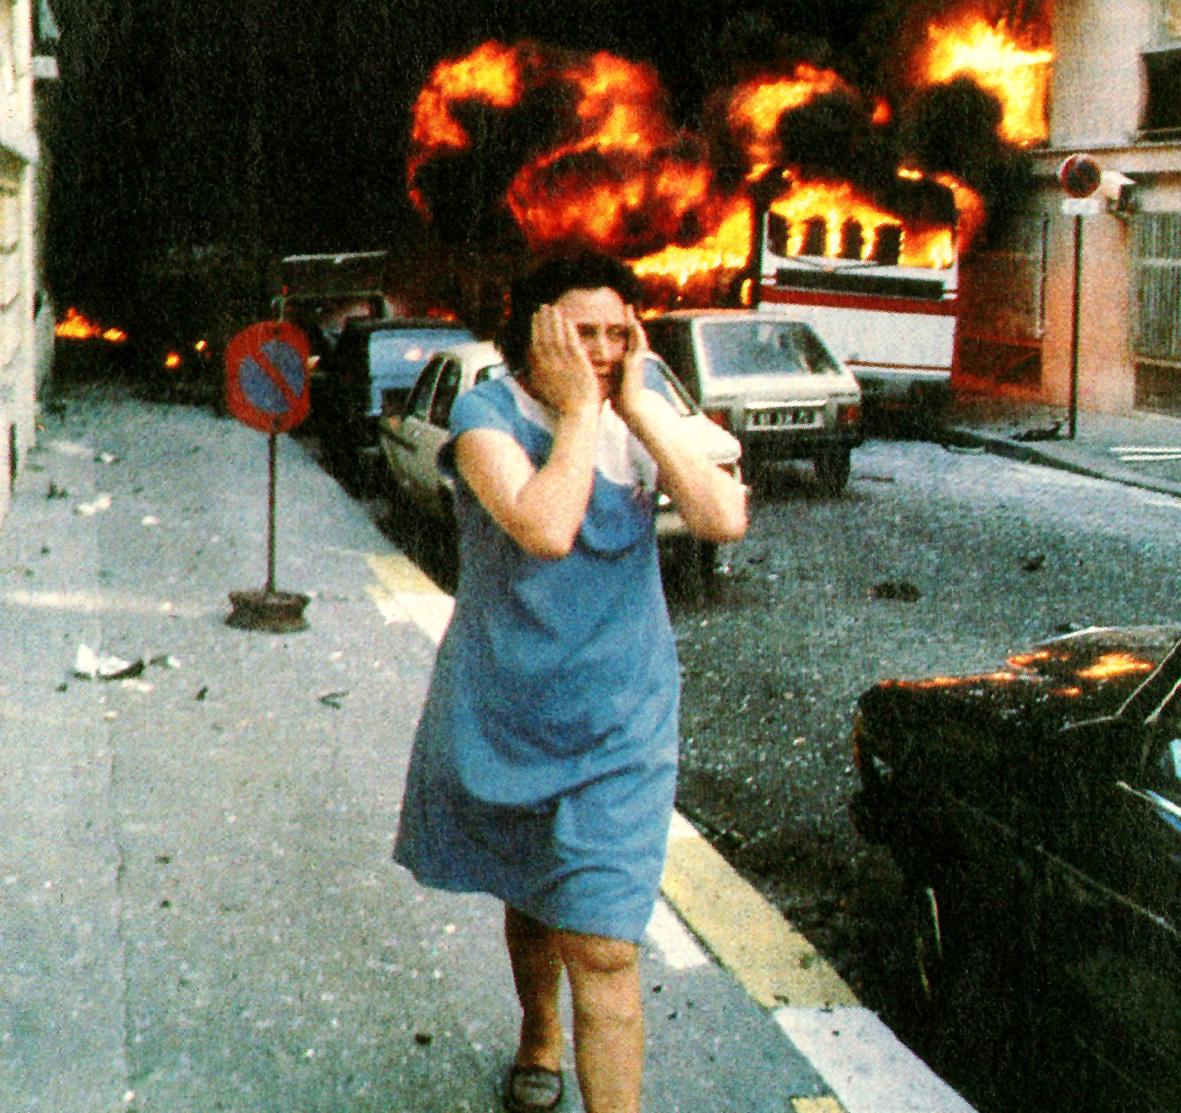 While withdrawal in Beirut, Terrorist bombing in Paris